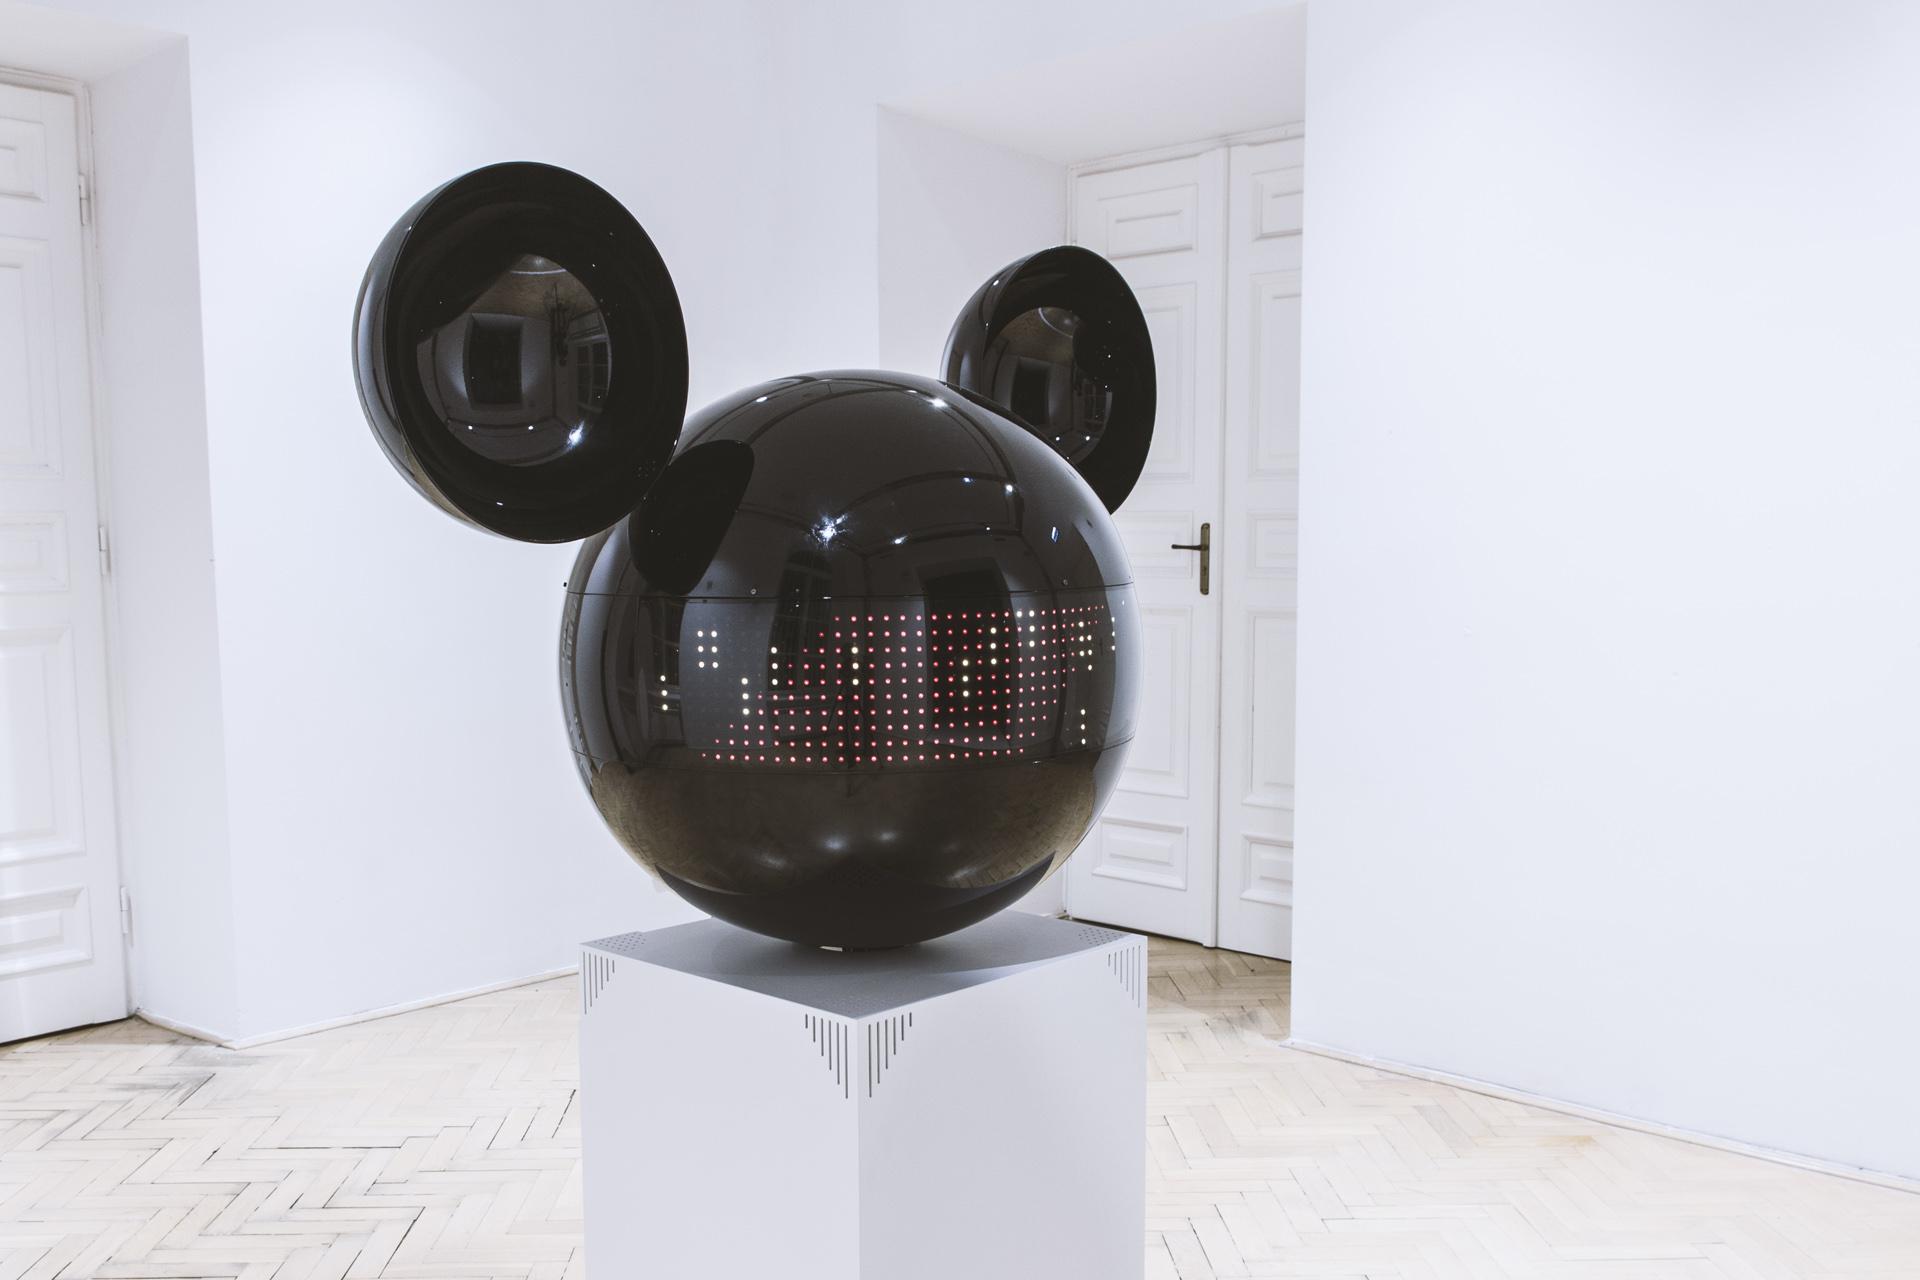 Mickeyphon_panGenerator (1)